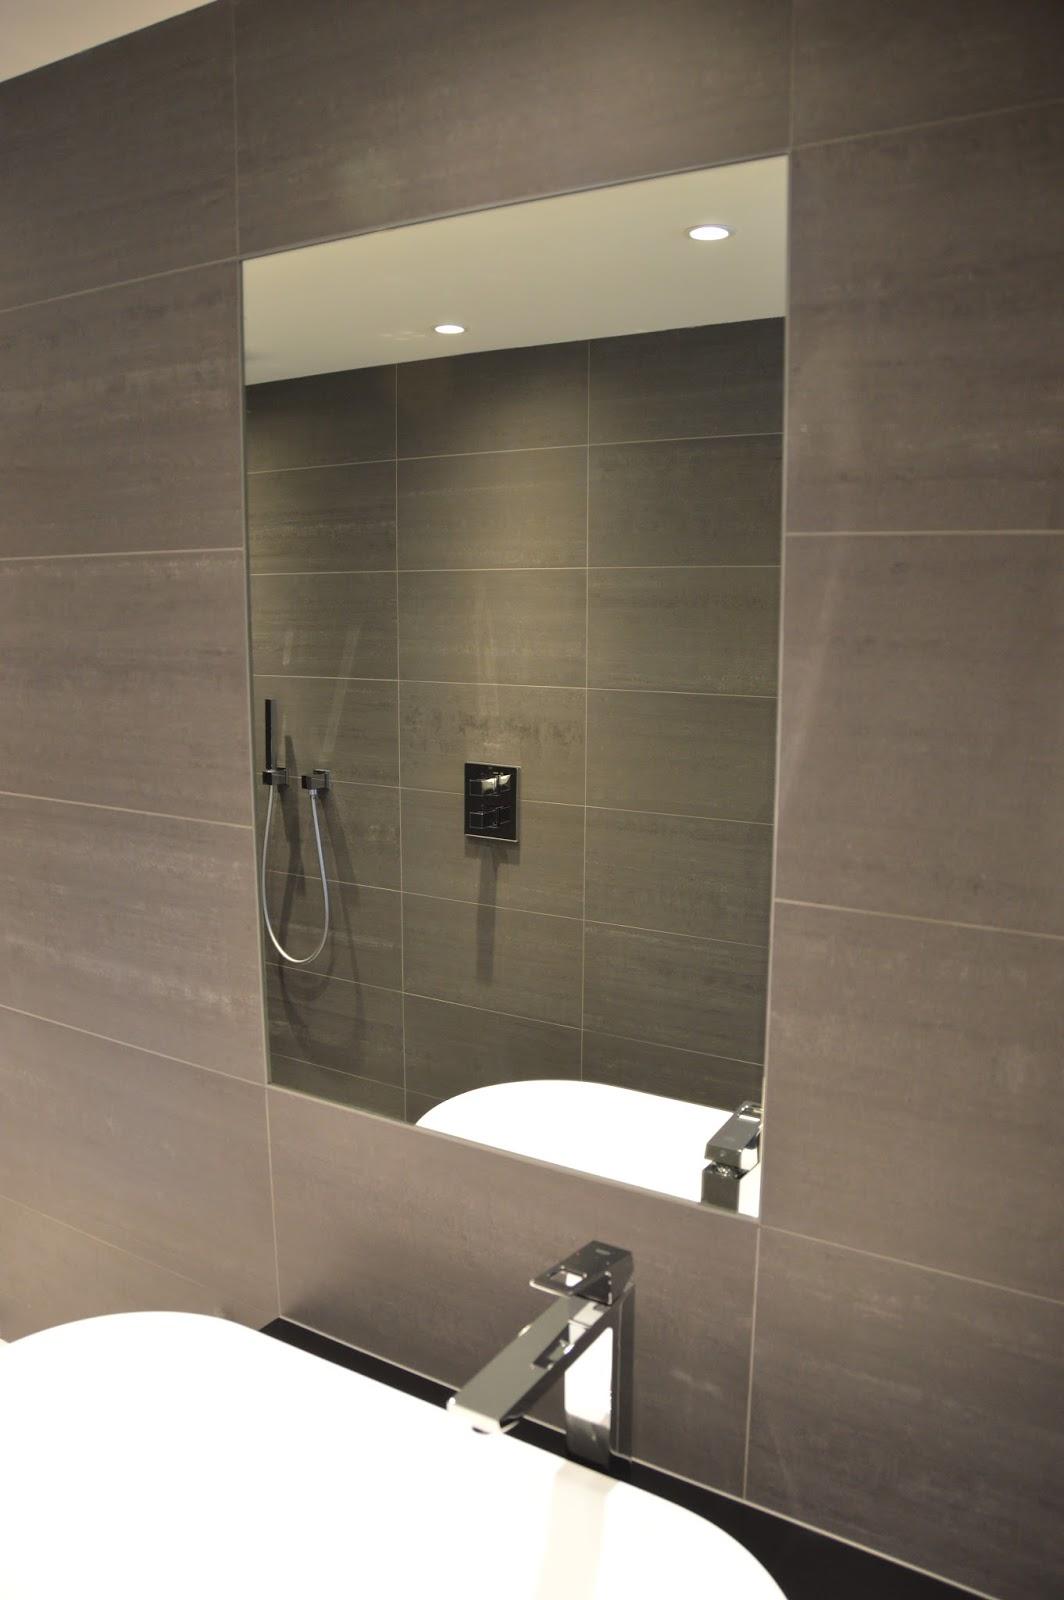 Gp interieur idee blog de badkamer en het toilet van thom en saskia - Idee van deco badkamer ...